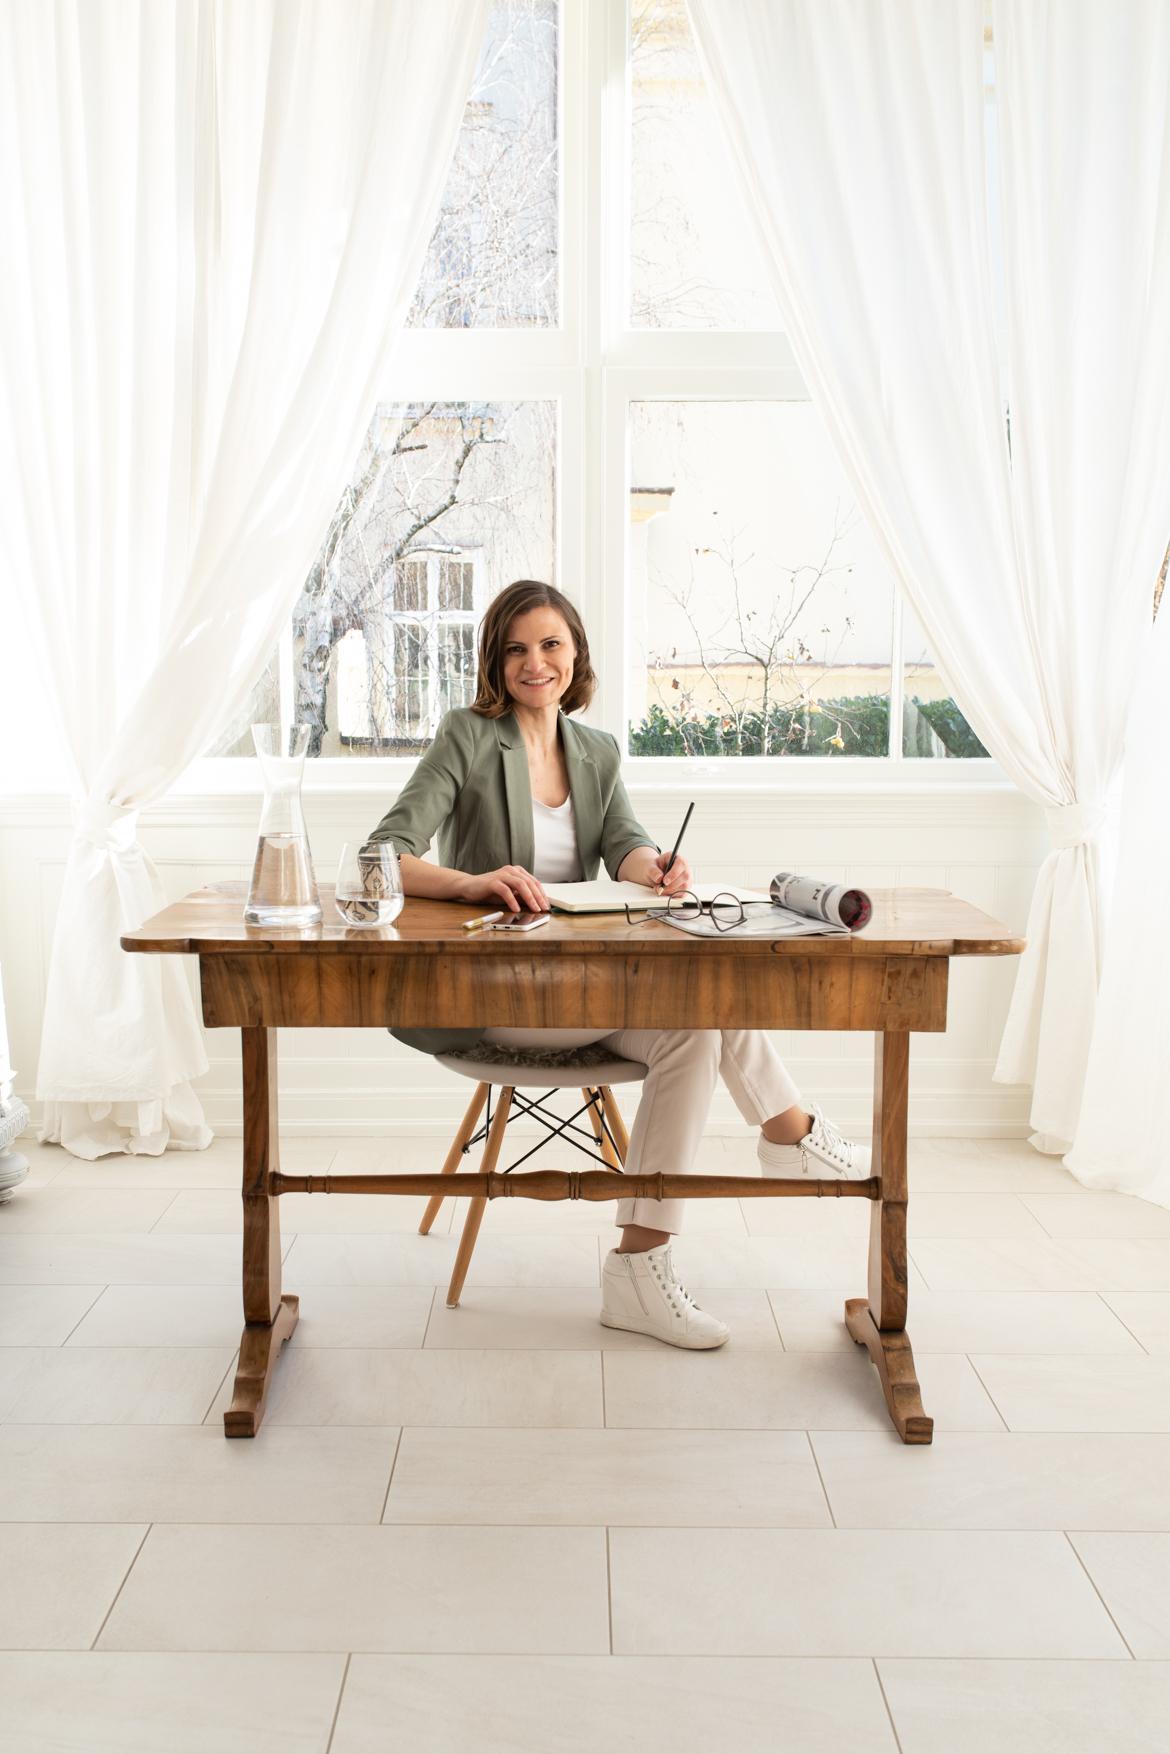 Sandra Warmuth - Ordnung schaffen